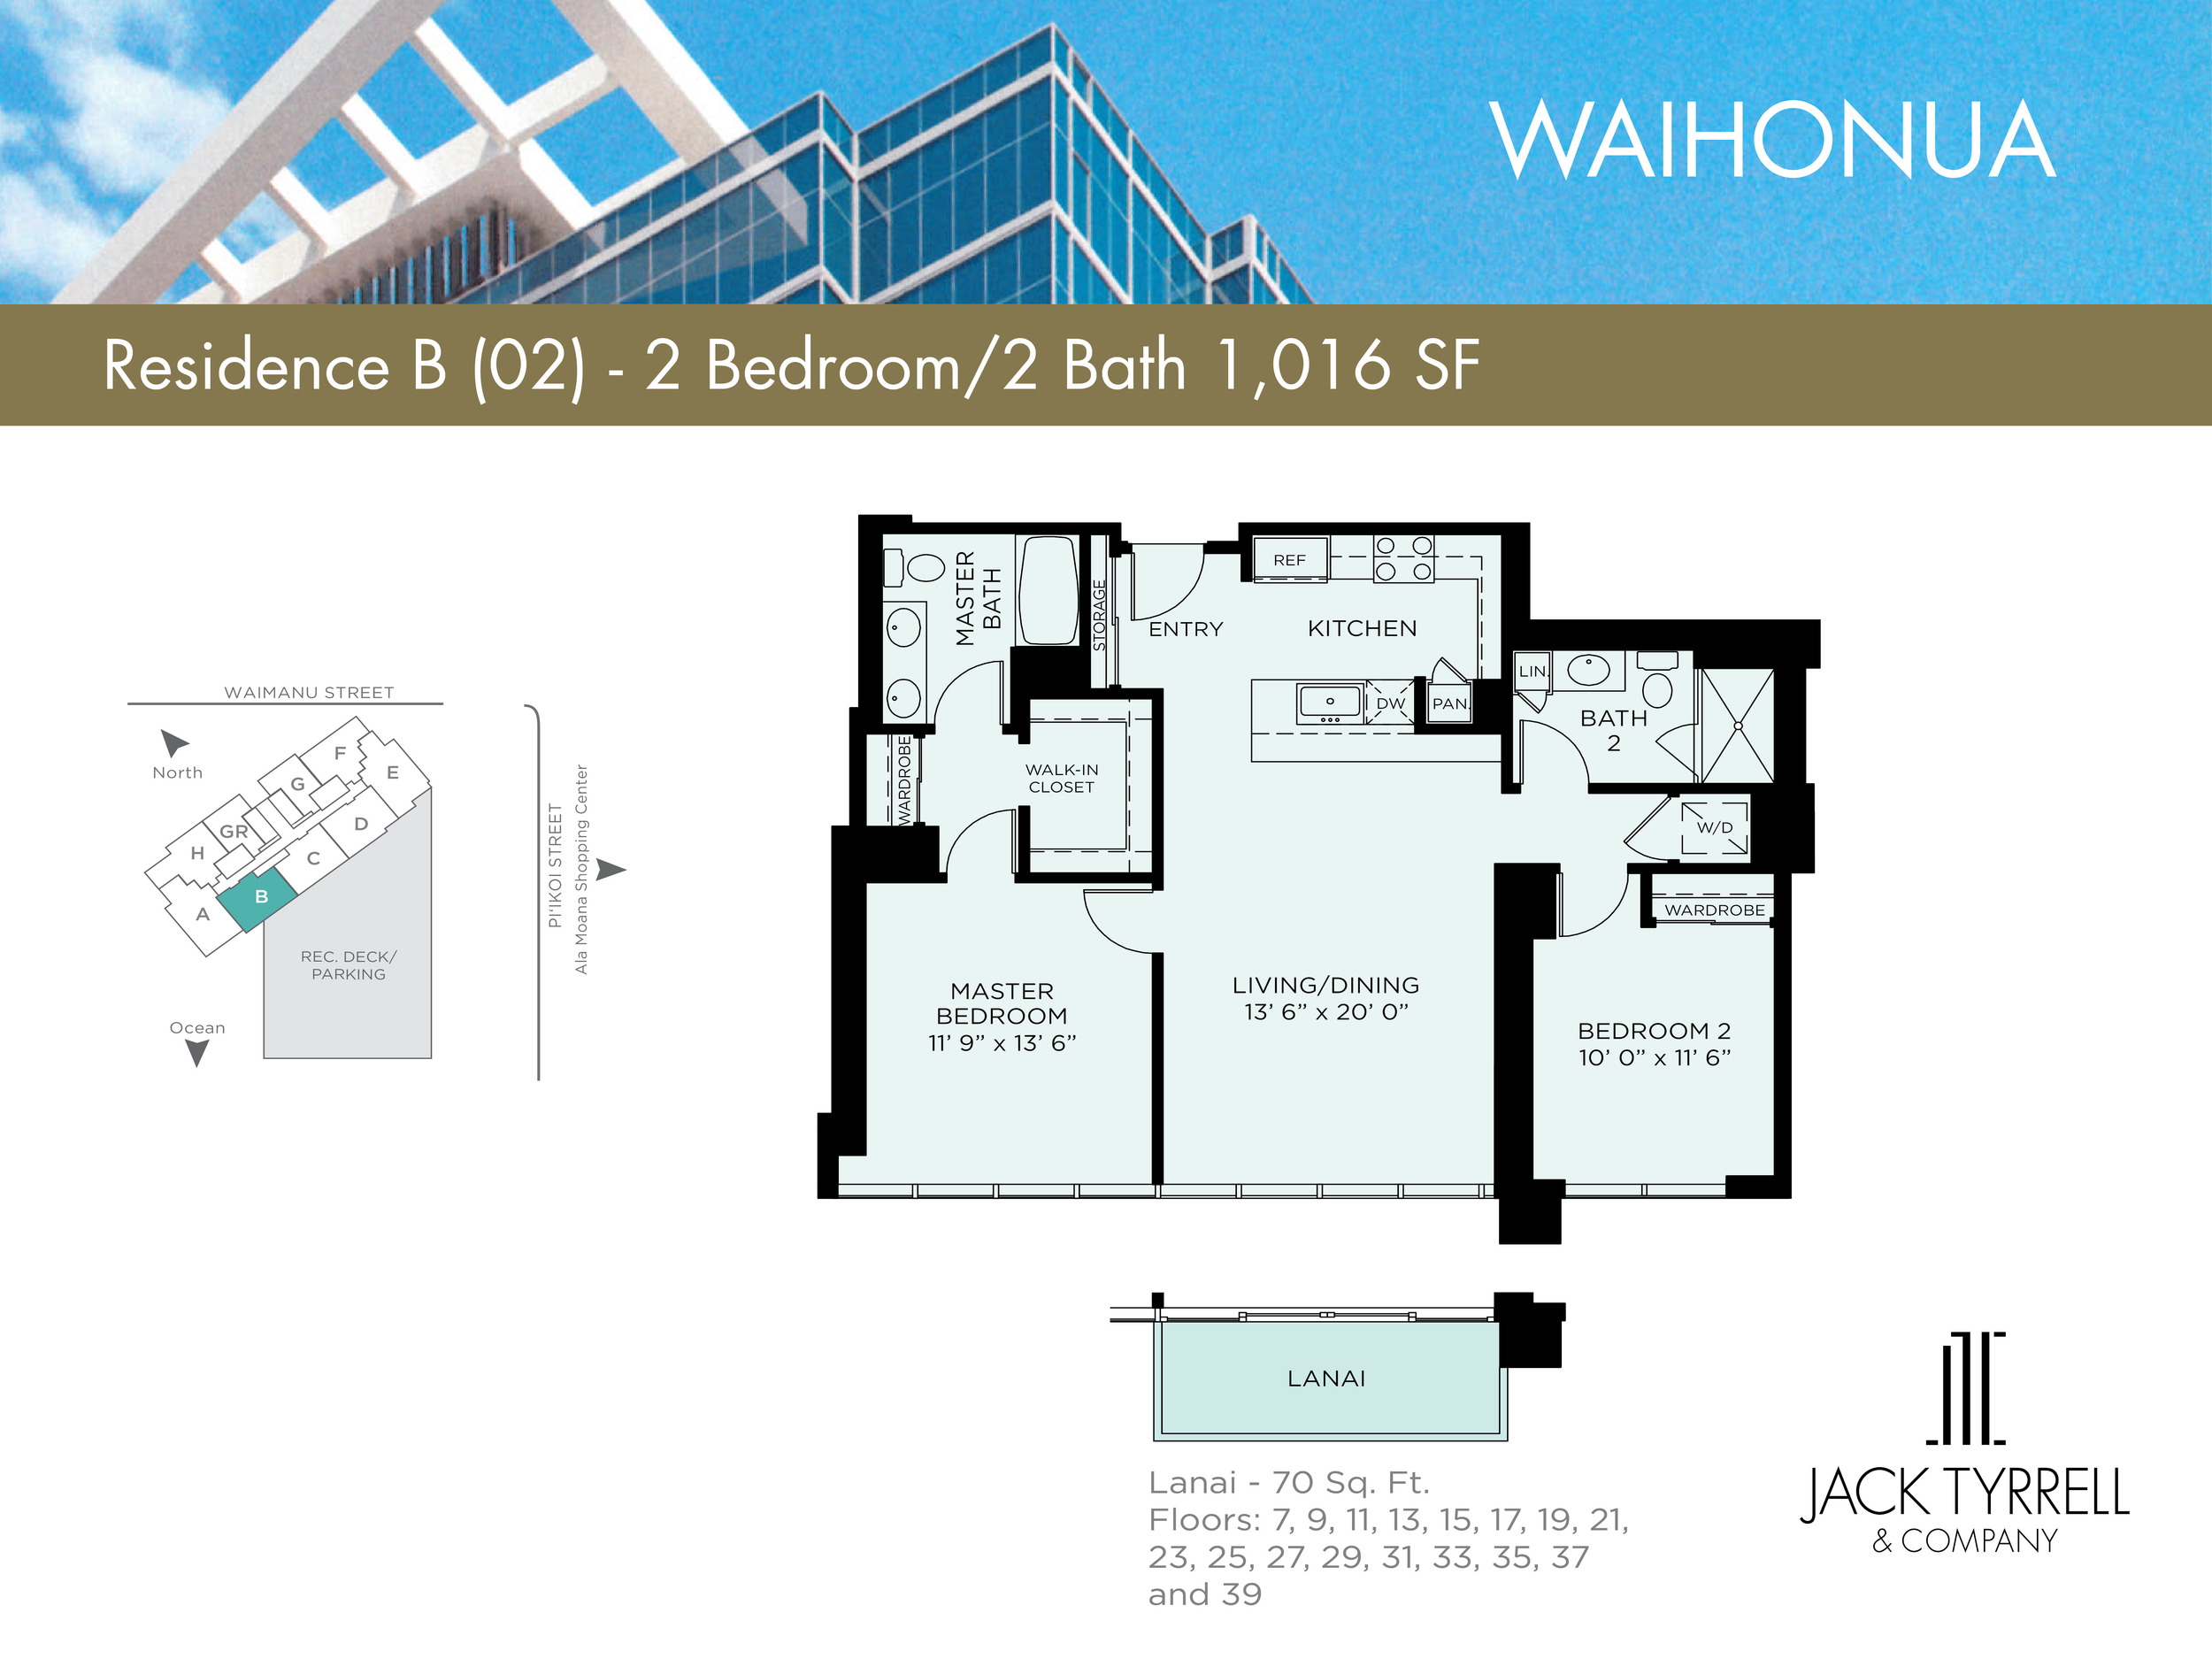 Waihonua 02Unit (B) Floor Plan -Estimated Monthly Maintenance fee is $910.05